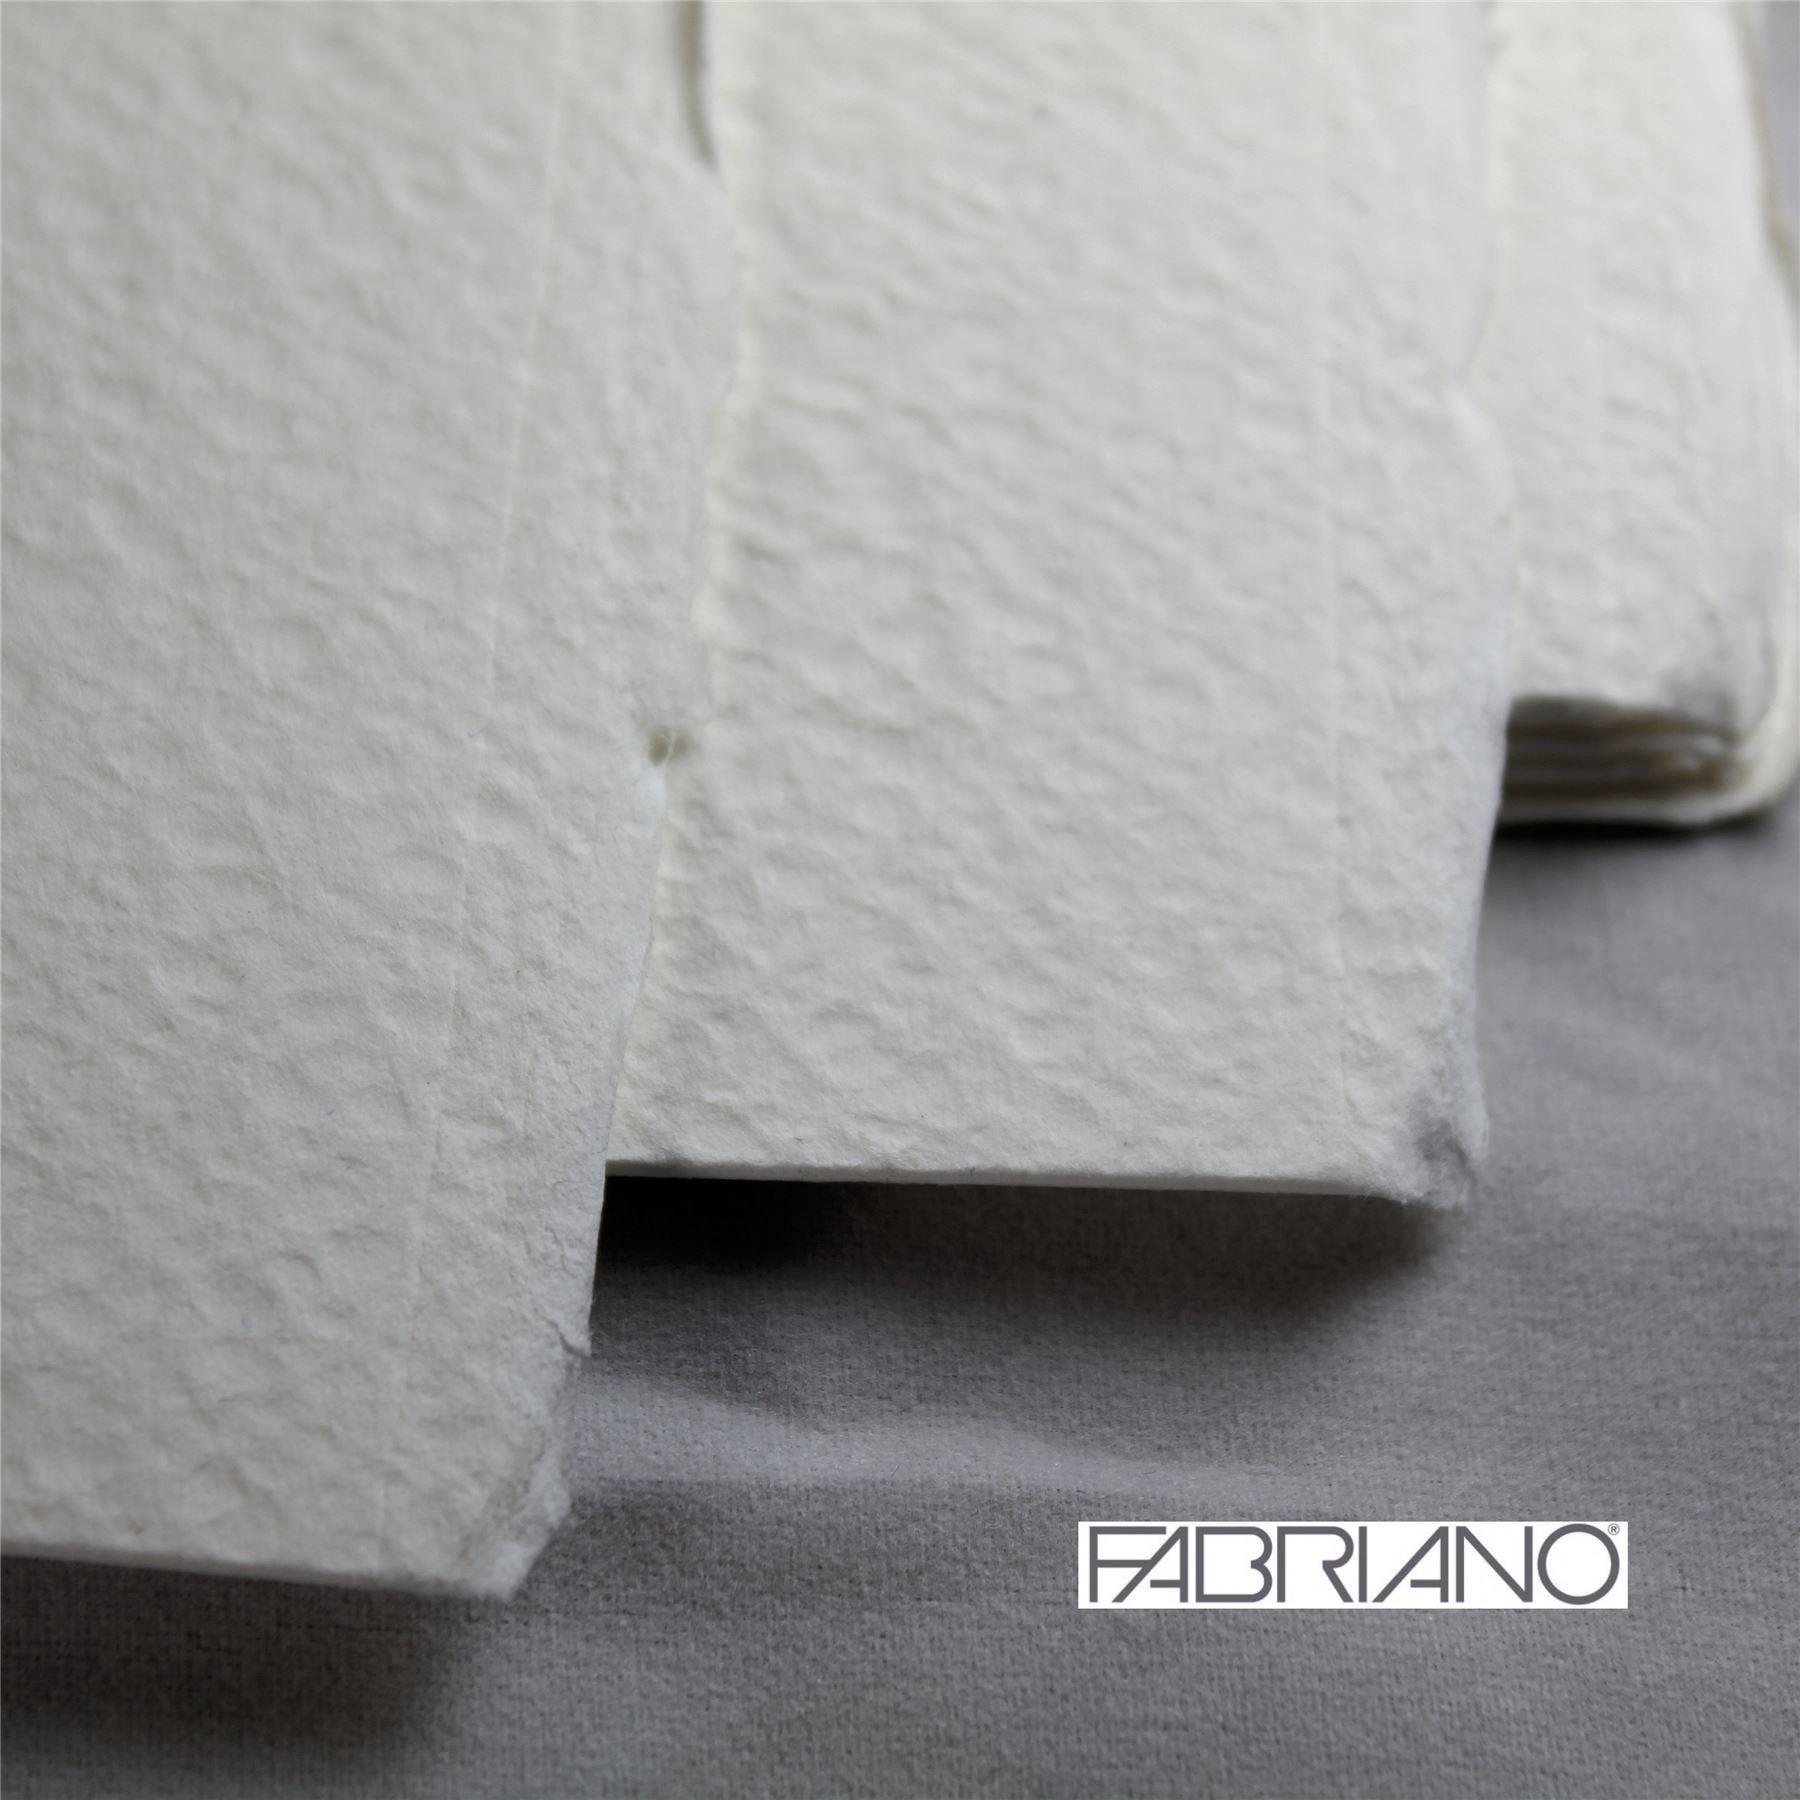 2 Sheets Fabriano Artistico 22 X15 640gsm Rough Paper